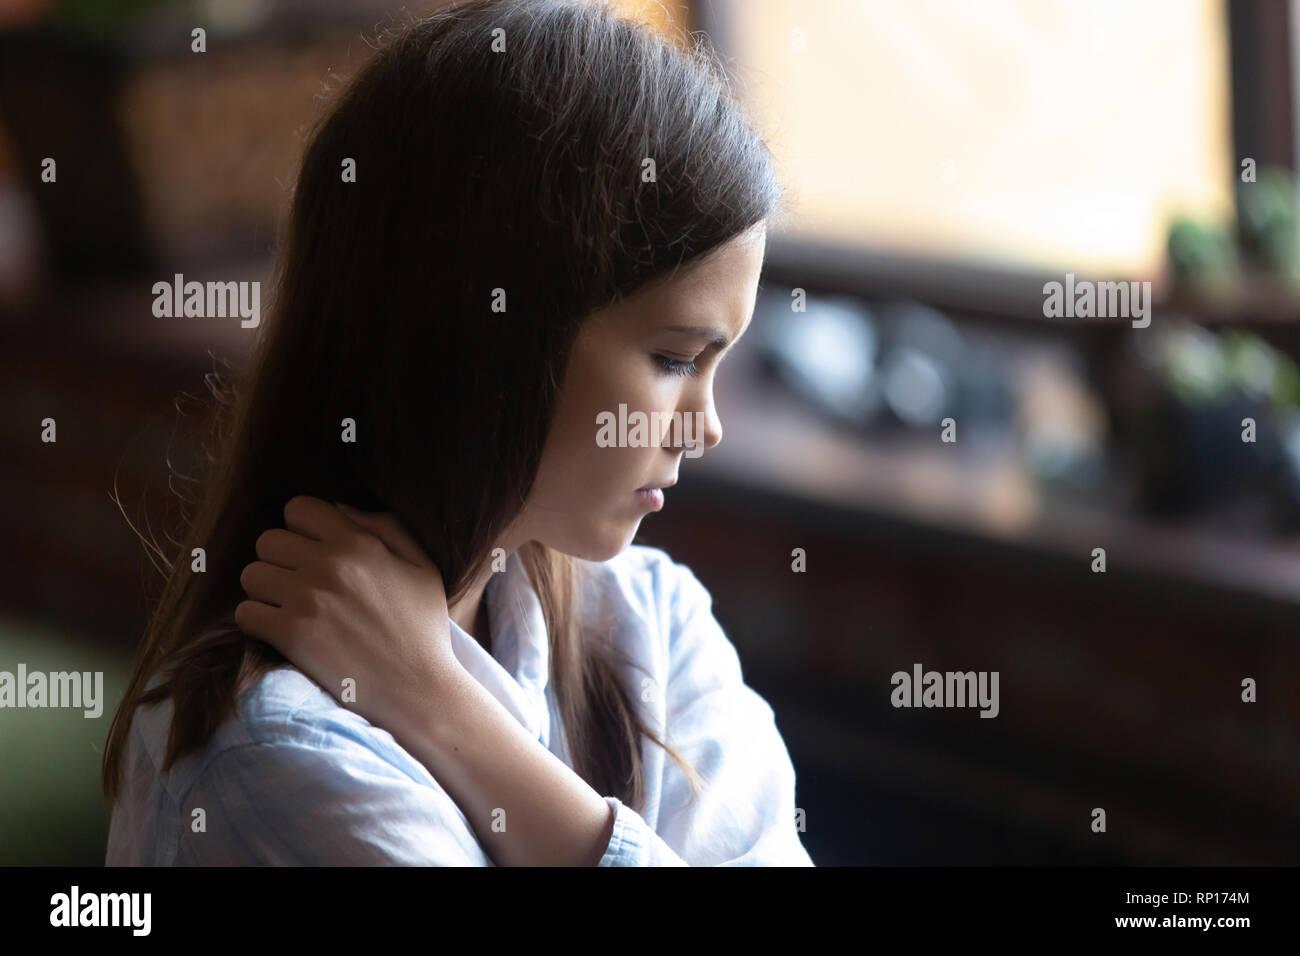 Sad and lonely female sitting alone indoors - Stock Image